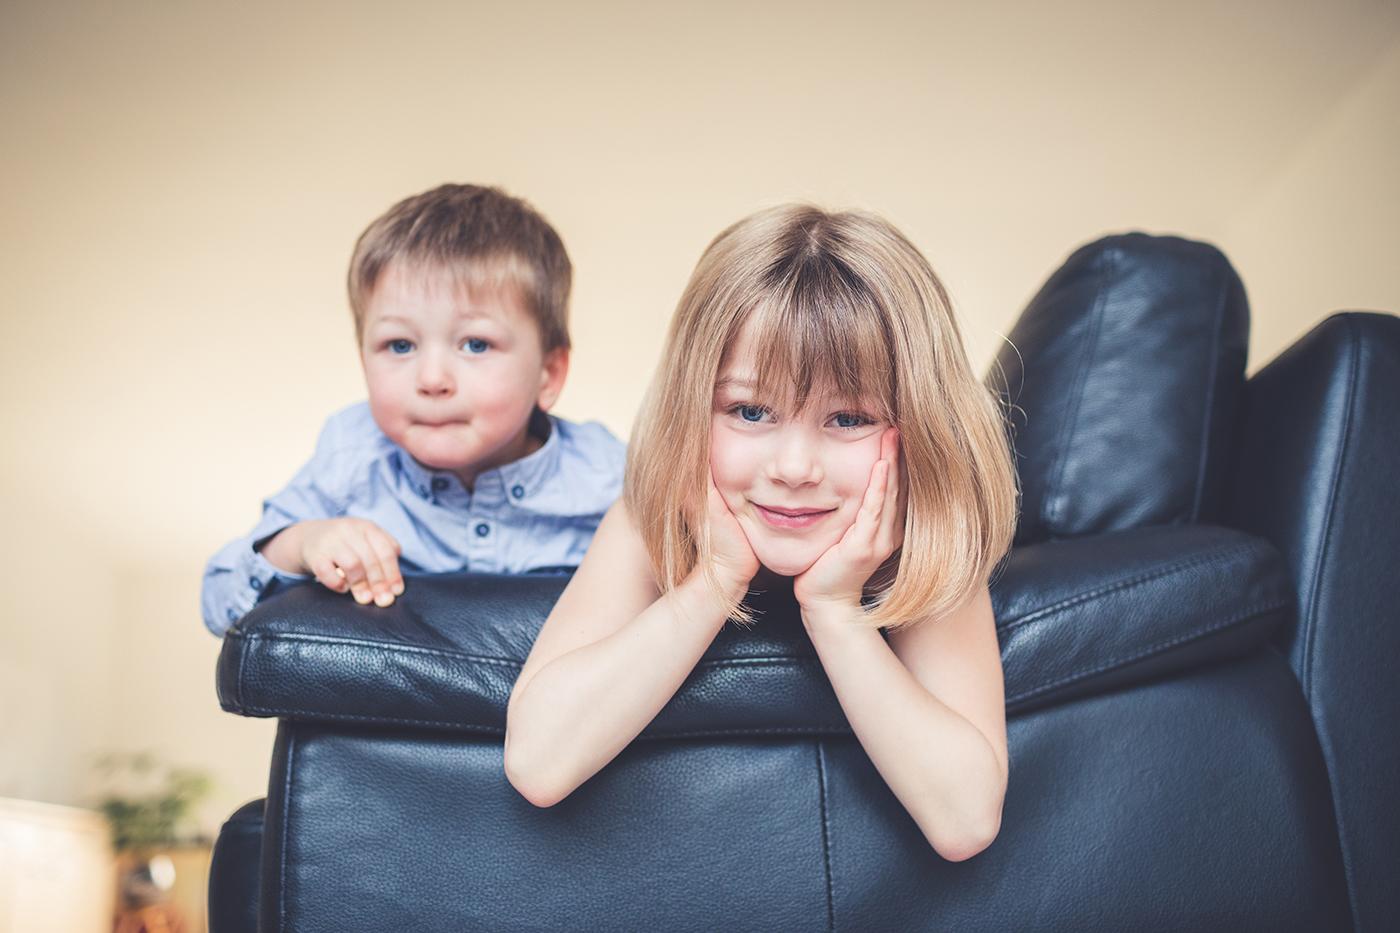 photographe-famille-enfant-poitiers-guillaume-heraud-16